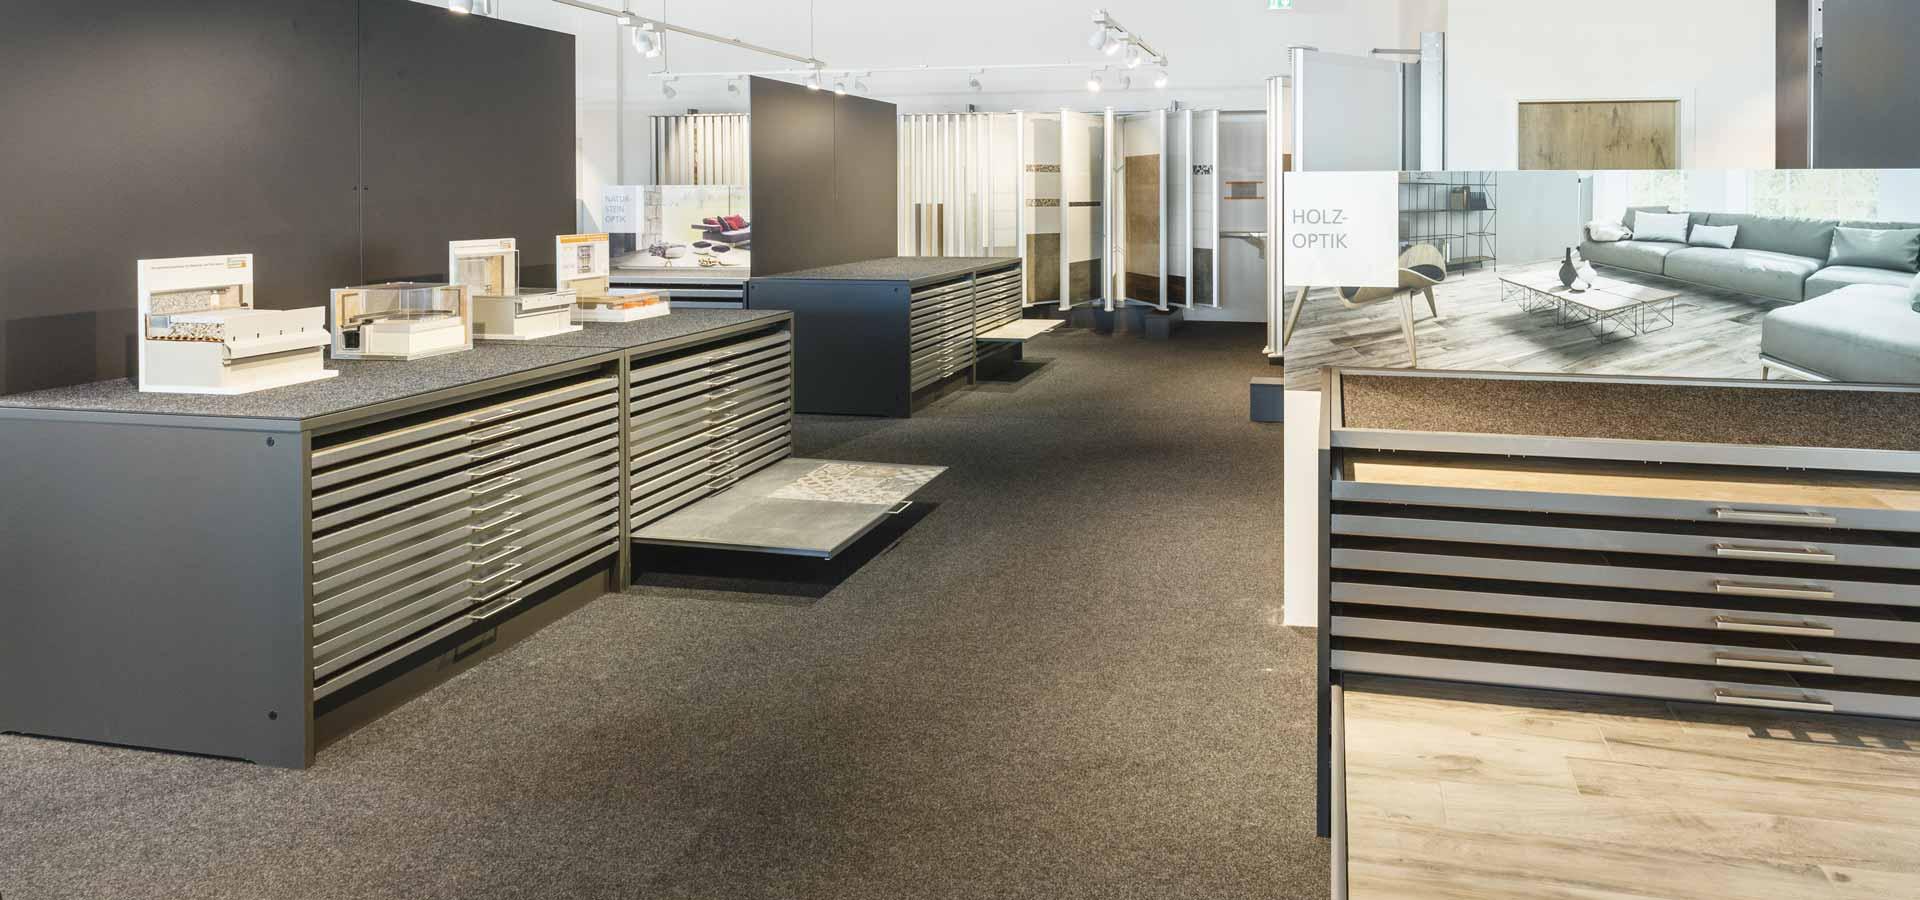 OPUS Marketing / Baustoffhandel / Ausstellung / Planung / Konzept / Produktplatzierung